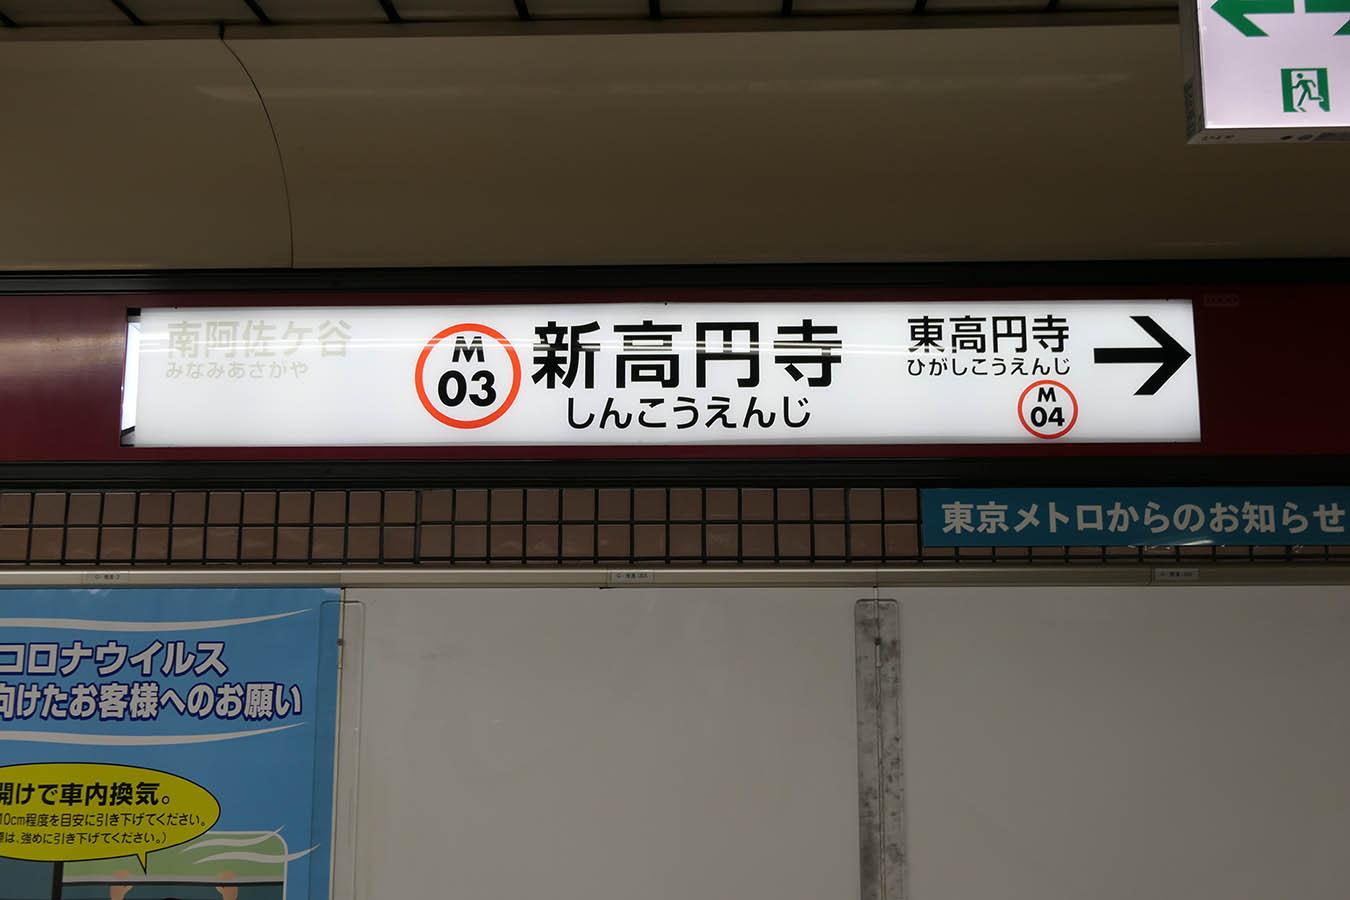 M03_photo04.jpg